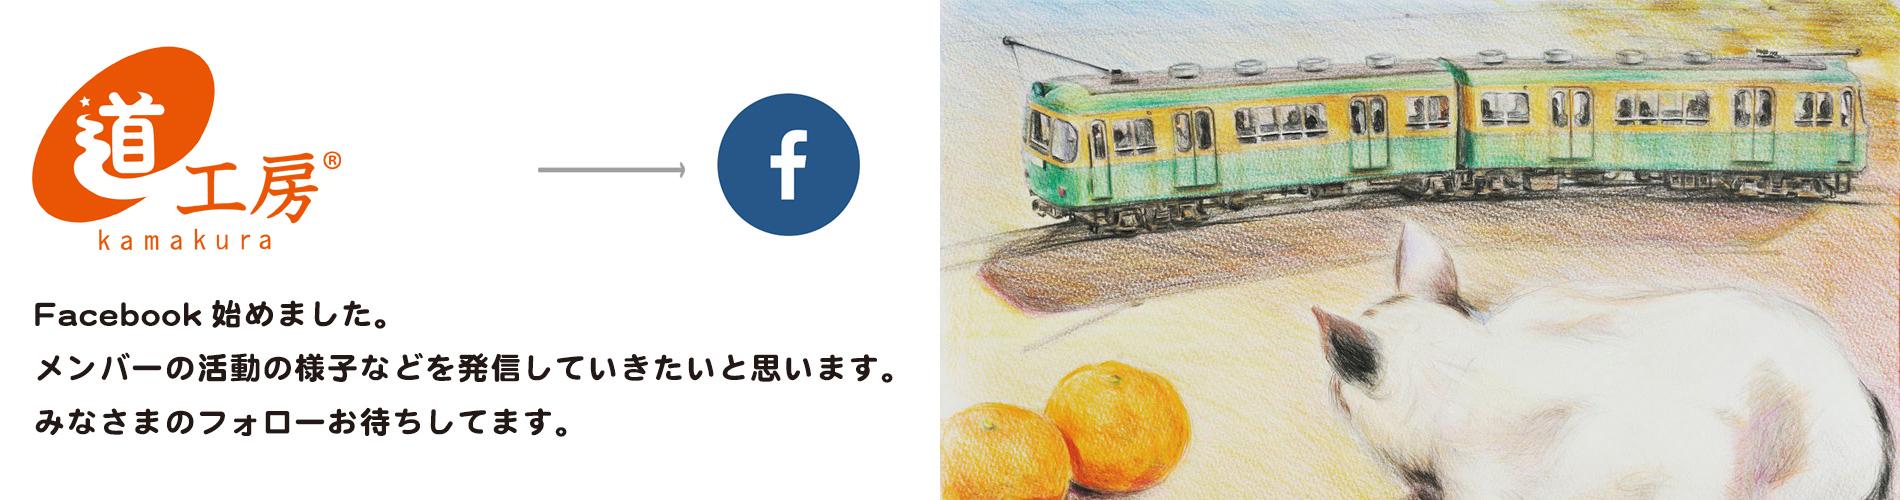 道工房FB